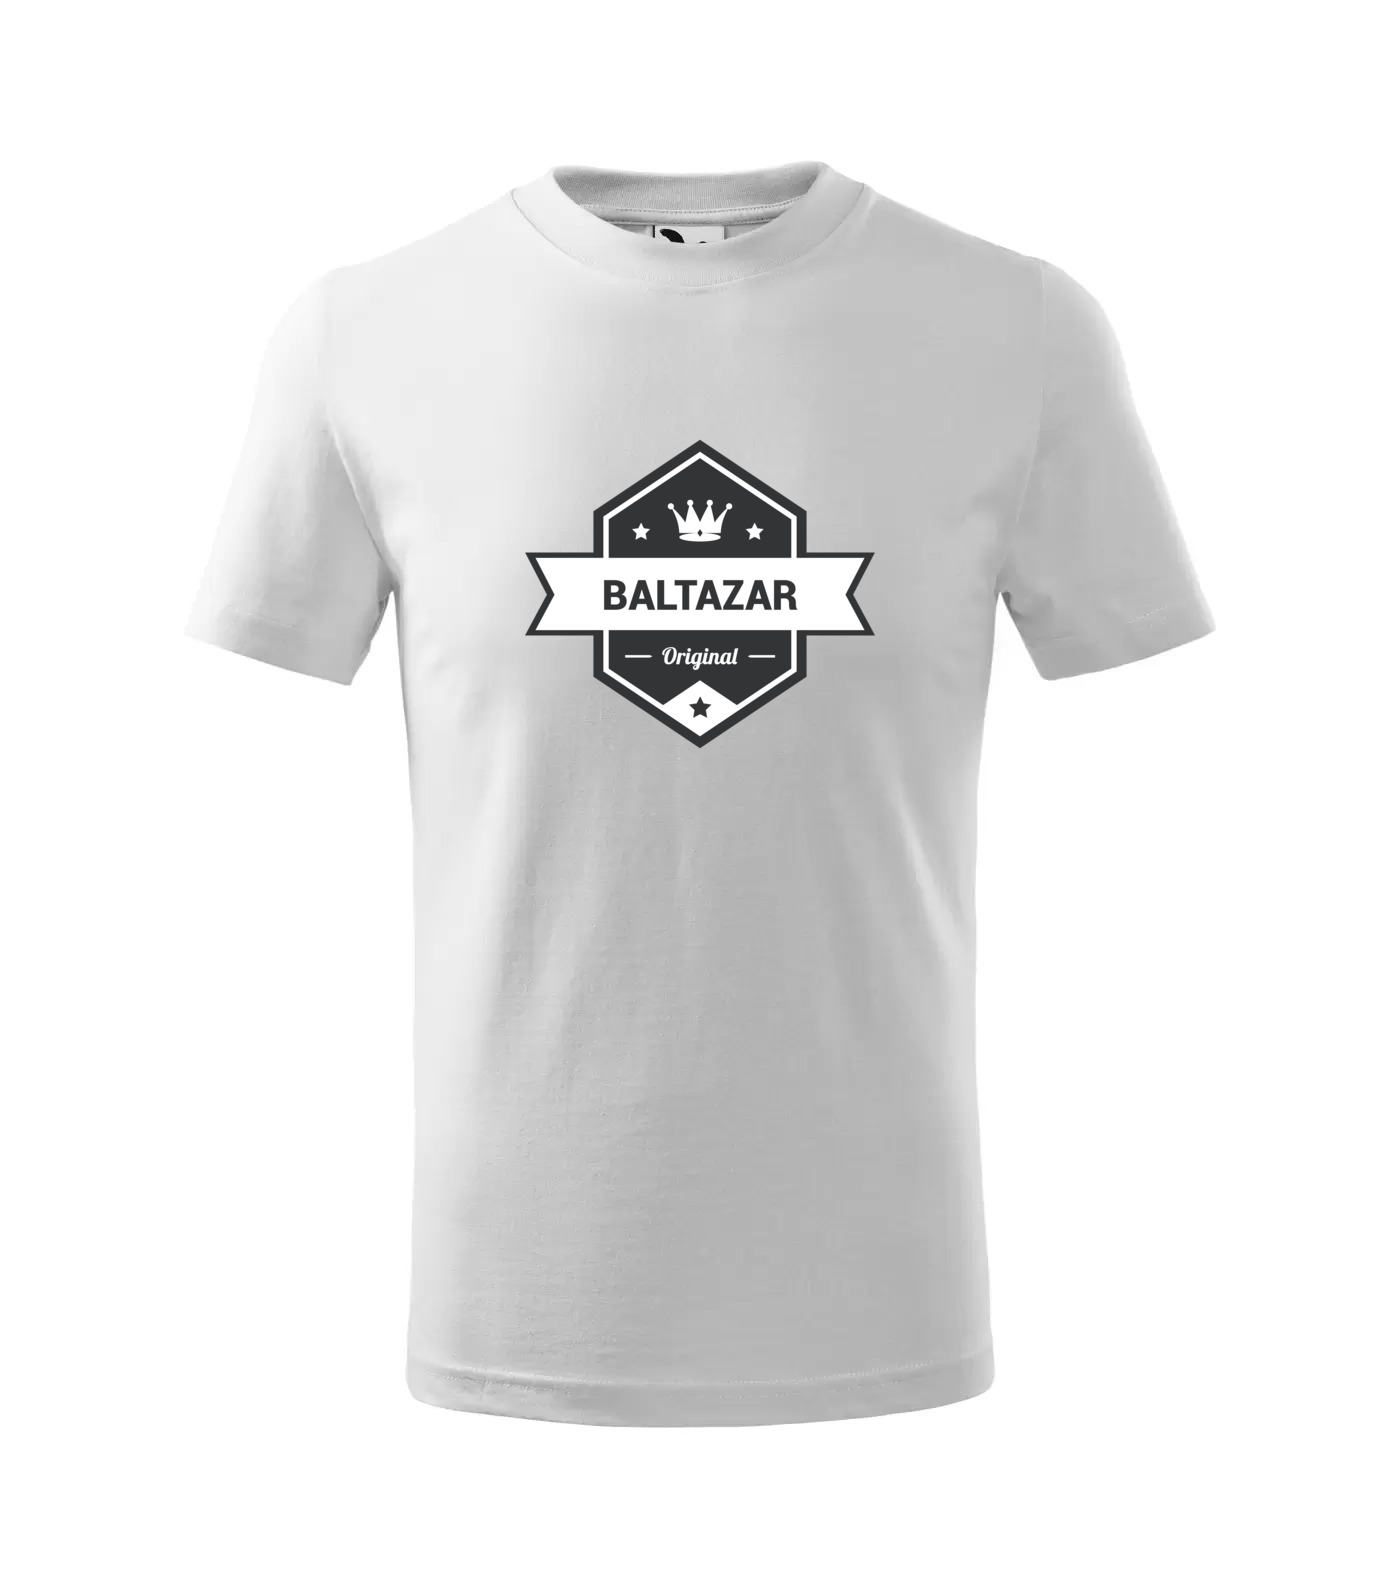 Tričko King Baltazar